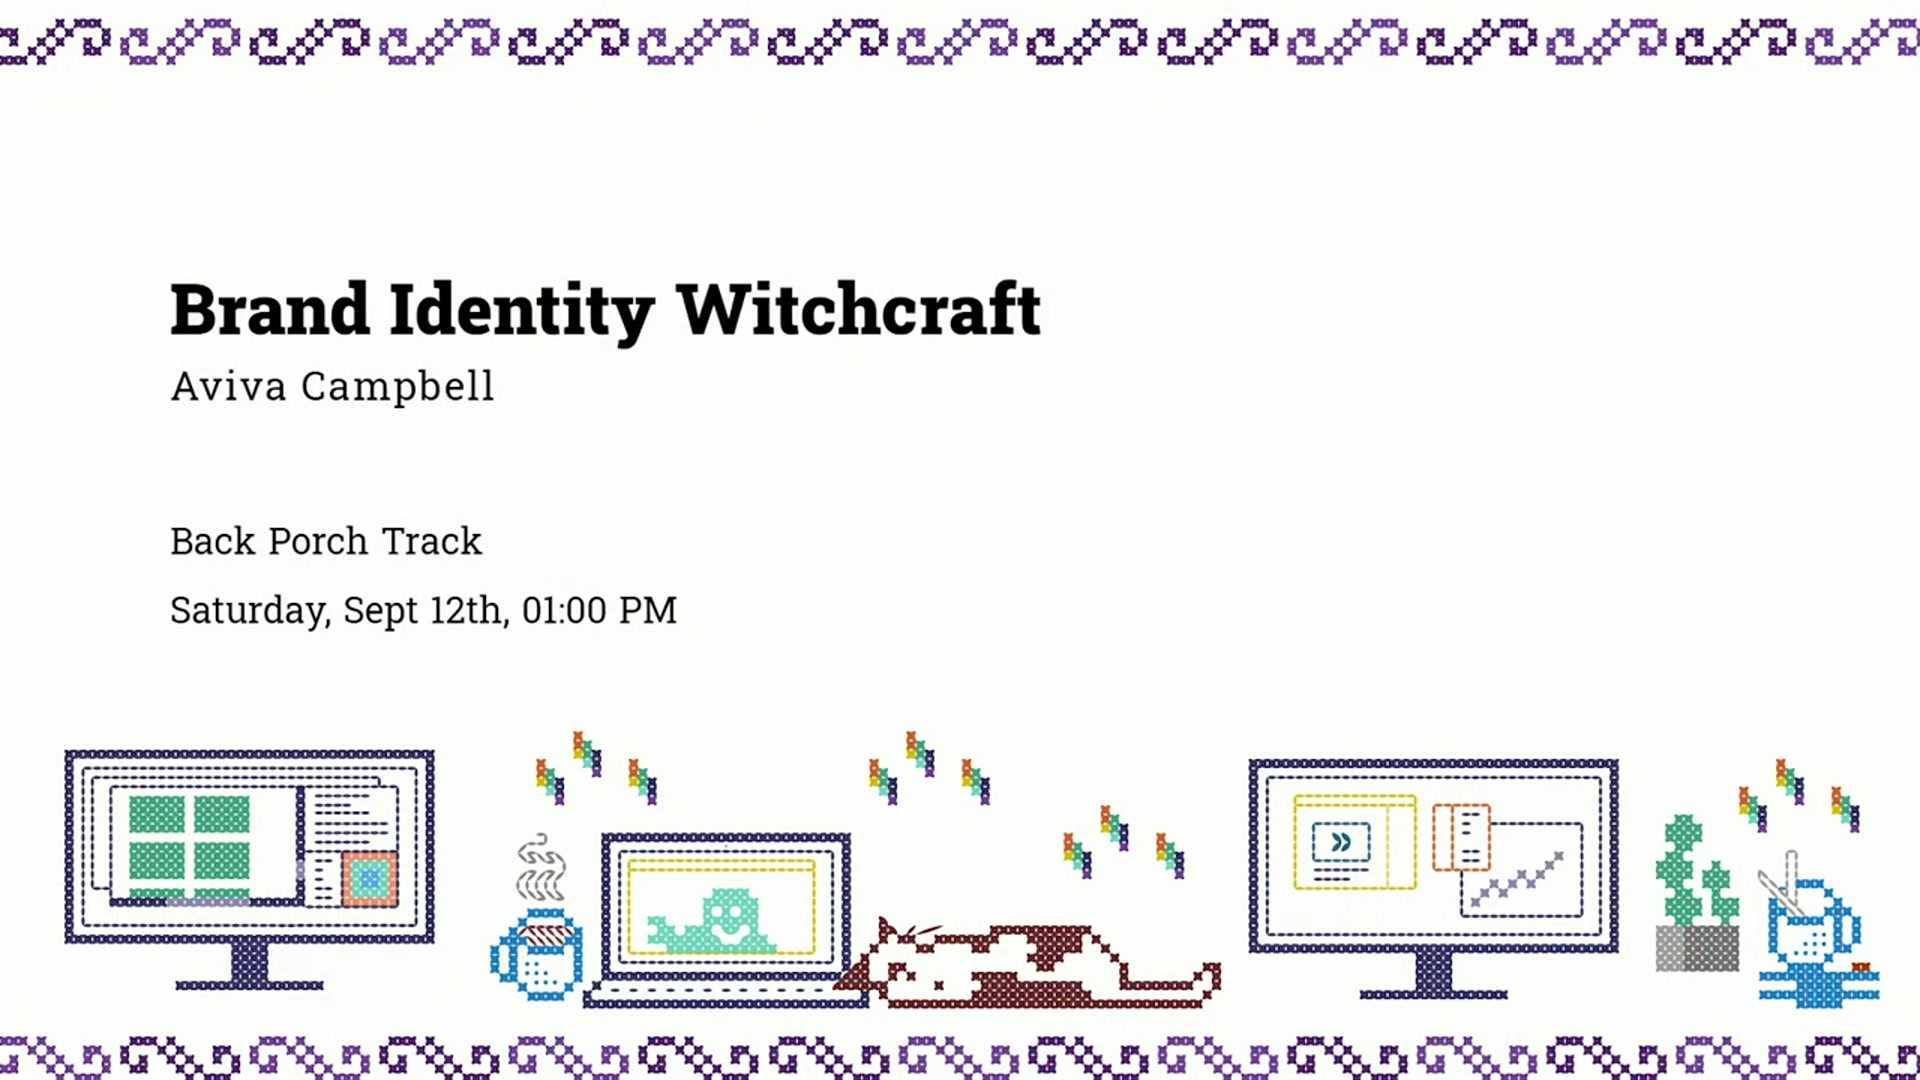 Aviva Campbell: Brand Identity Witchcraft